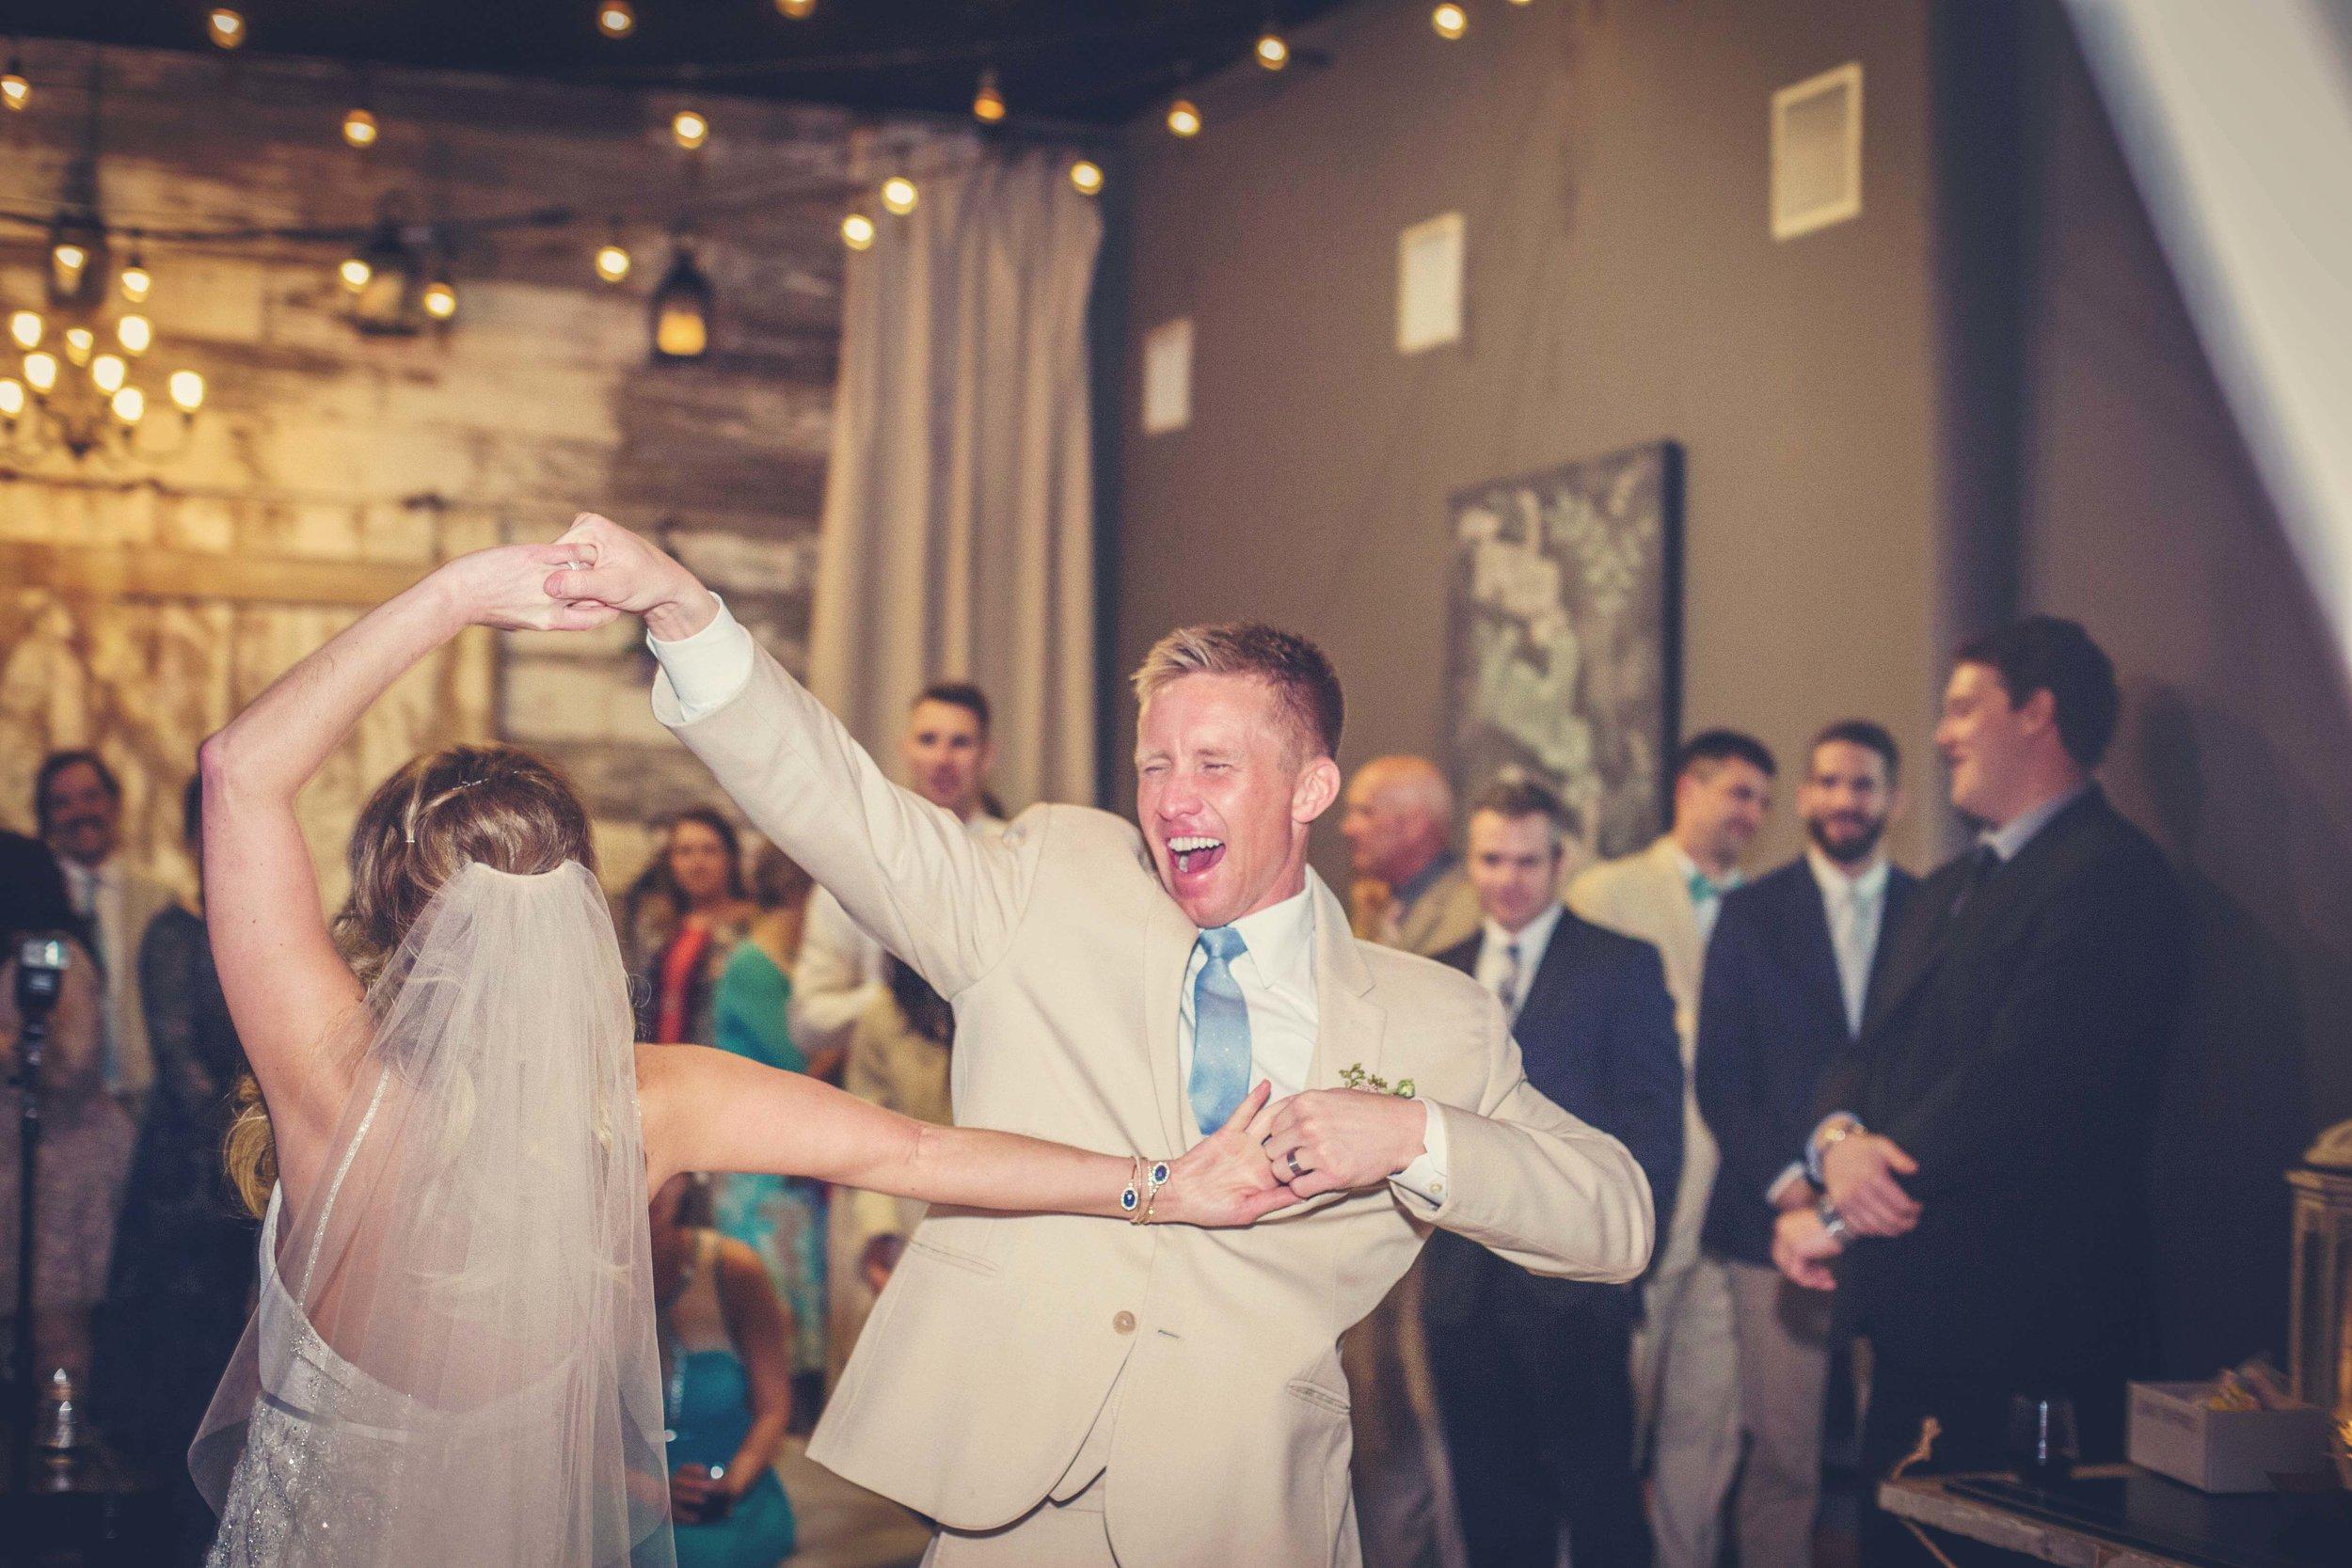 Kansas City-Small Wedding-Elope-Reception-Intimate-Ceremony-Megan & Jeff-261b.jpg